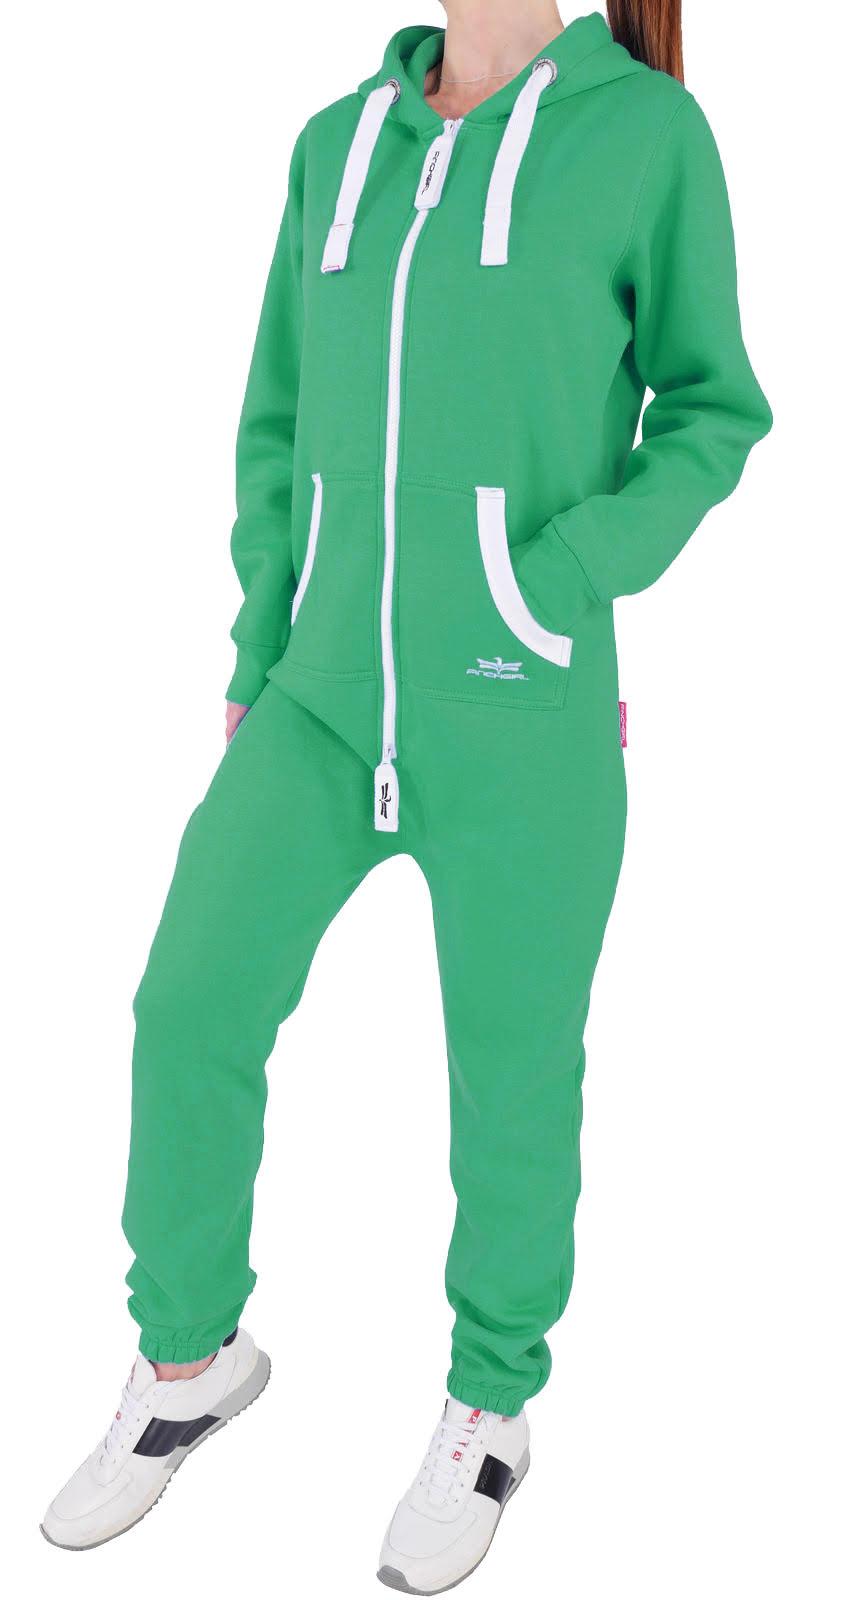 finchgirl damen jumpsuit jogger einteiler jogging anzug. Black Bedroom Furniture Sets. Home Design Ideas